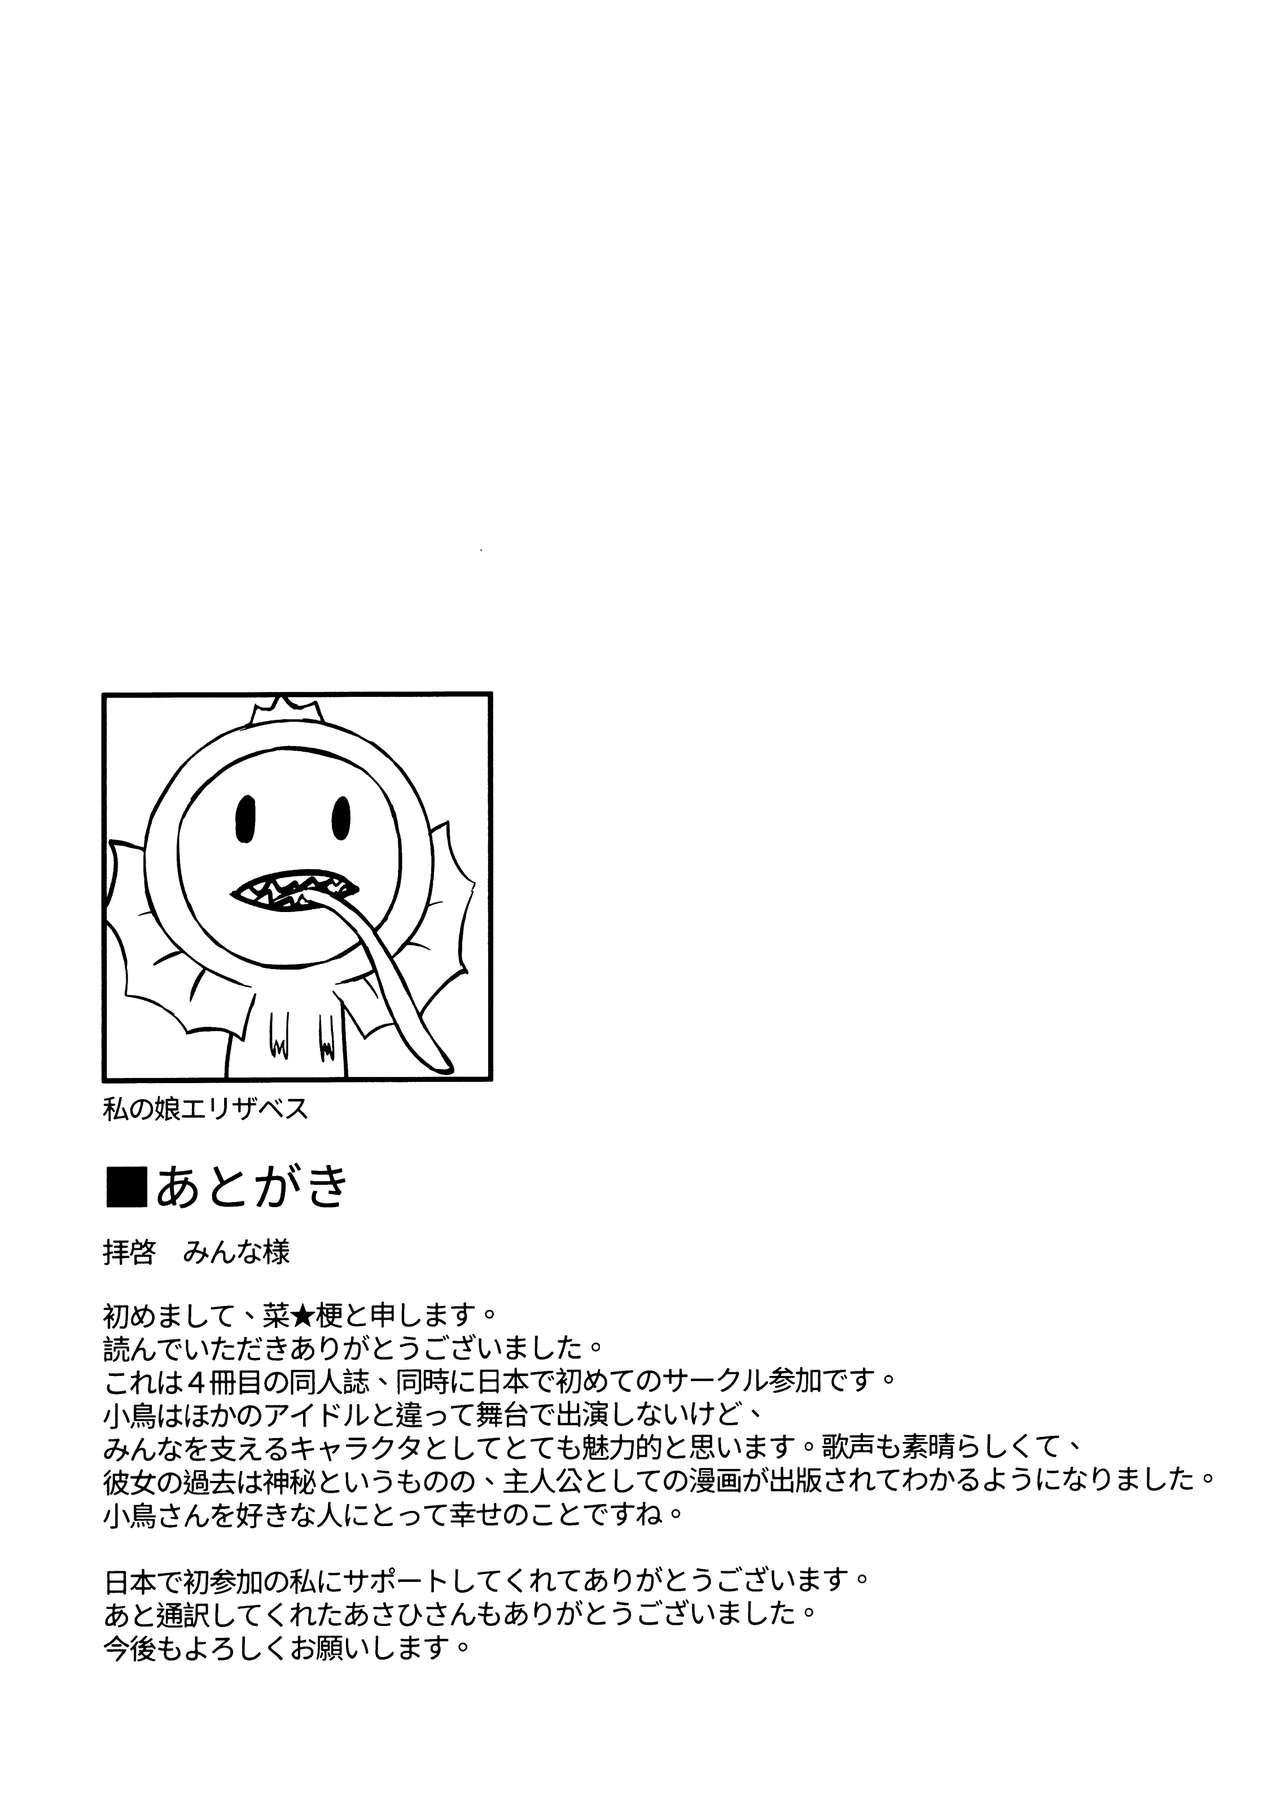 Kotori-san to Nomikai... Shite kara + Omake 25